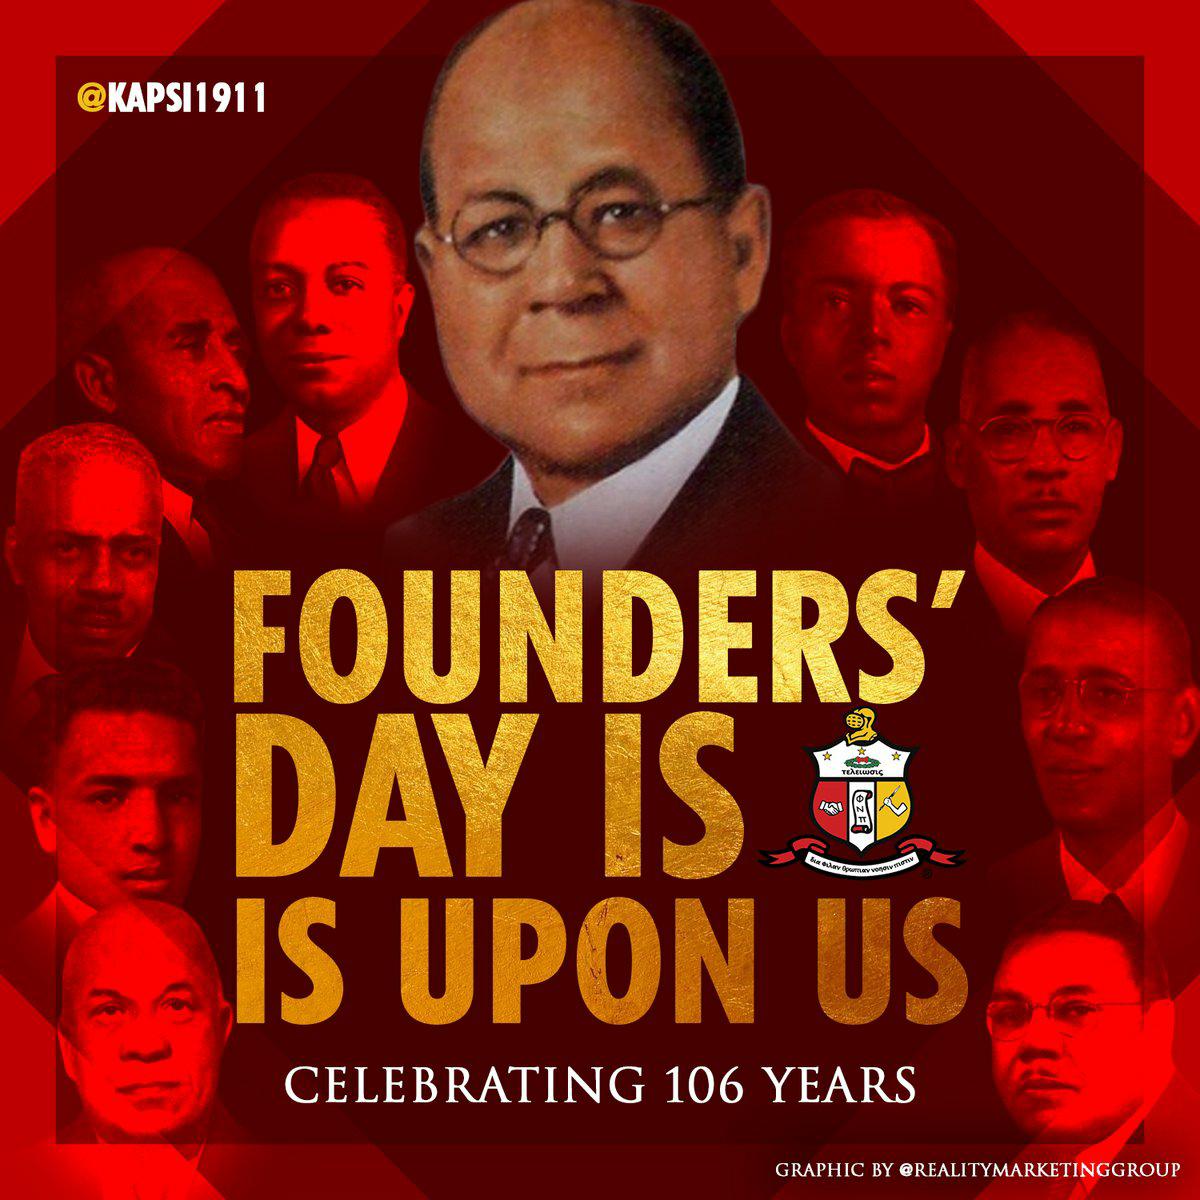 Happy Founders' Day Kappa Alpha Psi Fraternity, Inc #106yrs